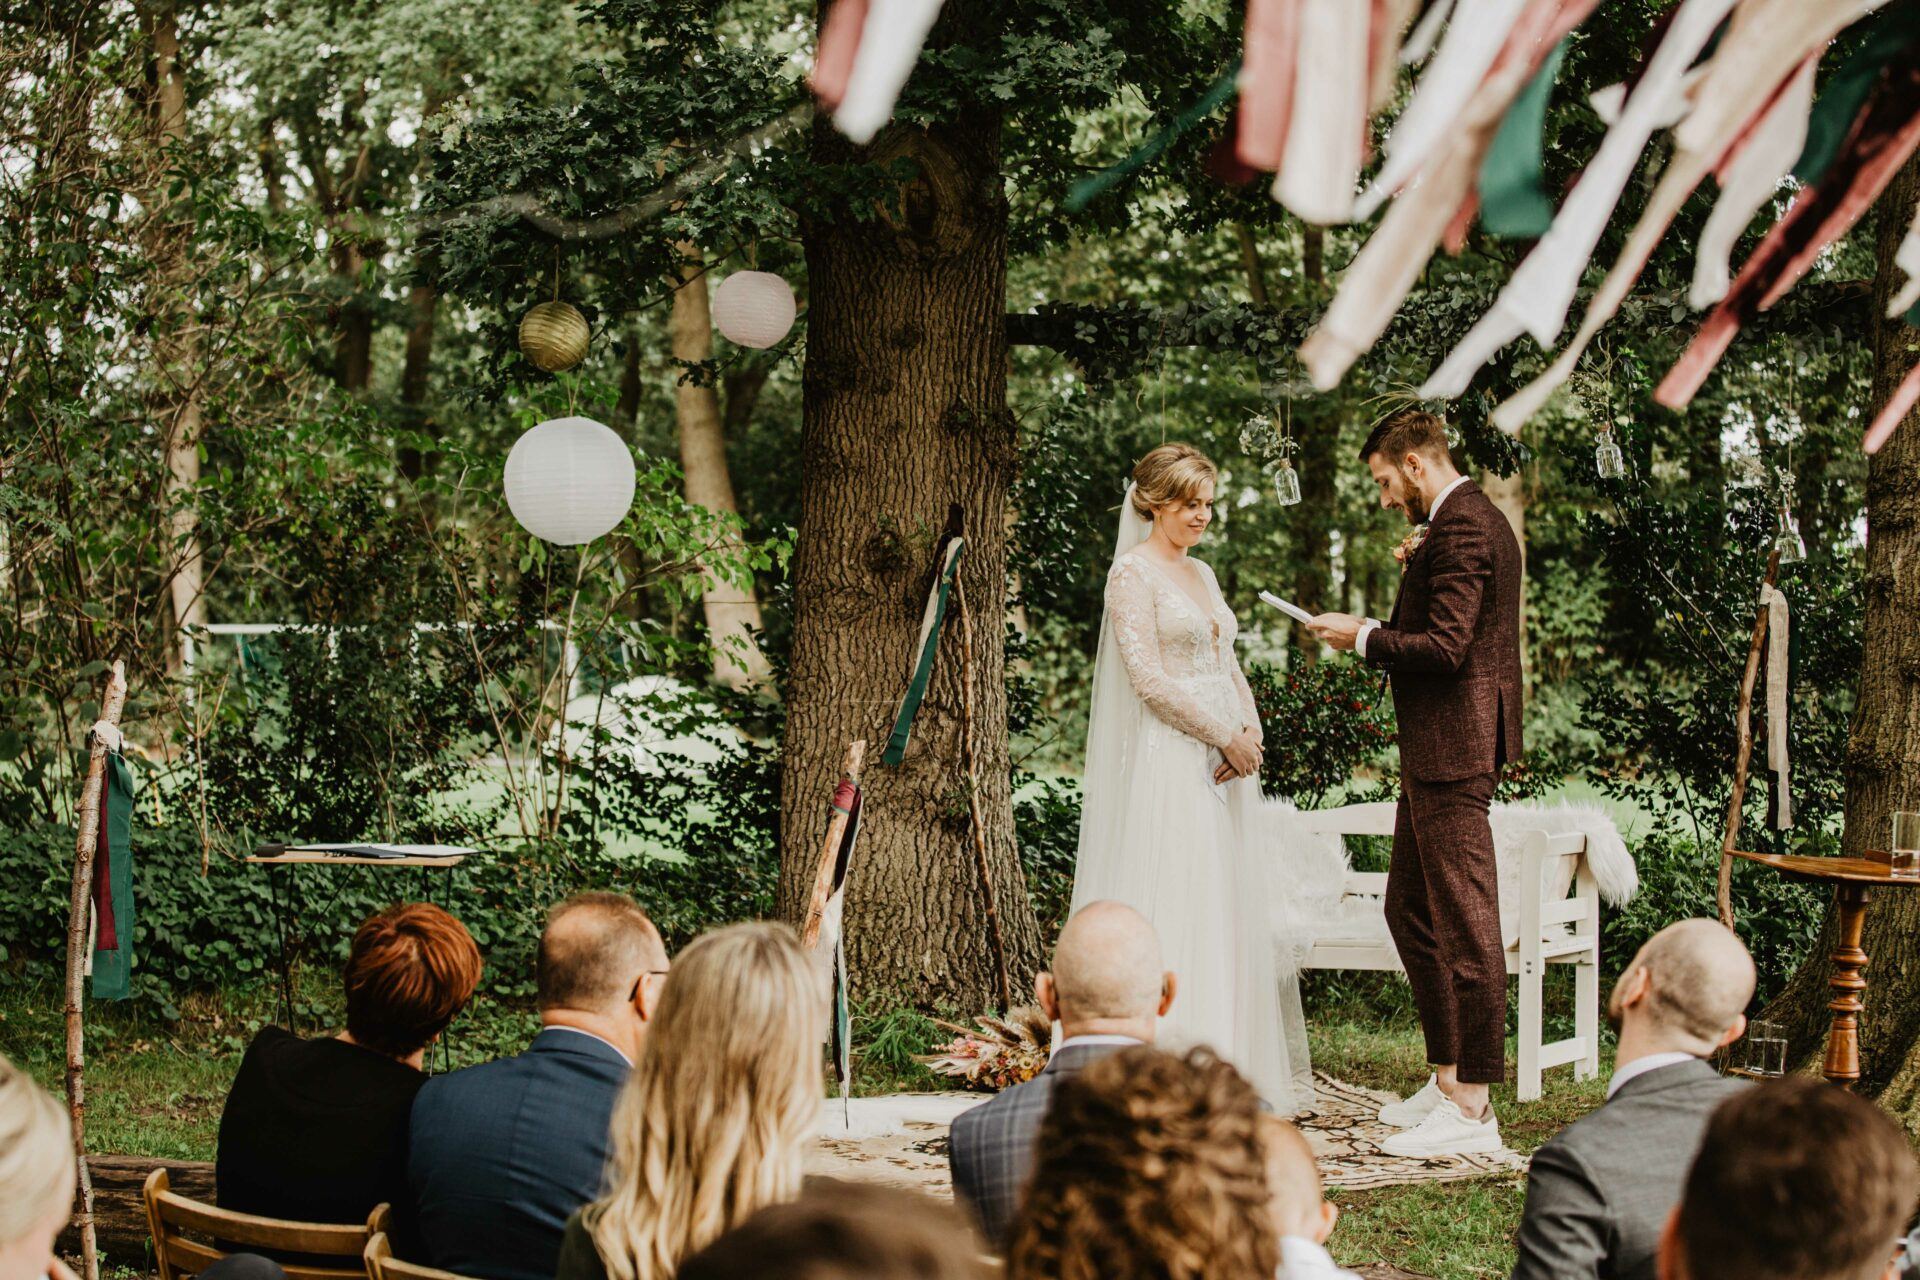 Ceremonie bruiloft hoeve kindergoed ermelo